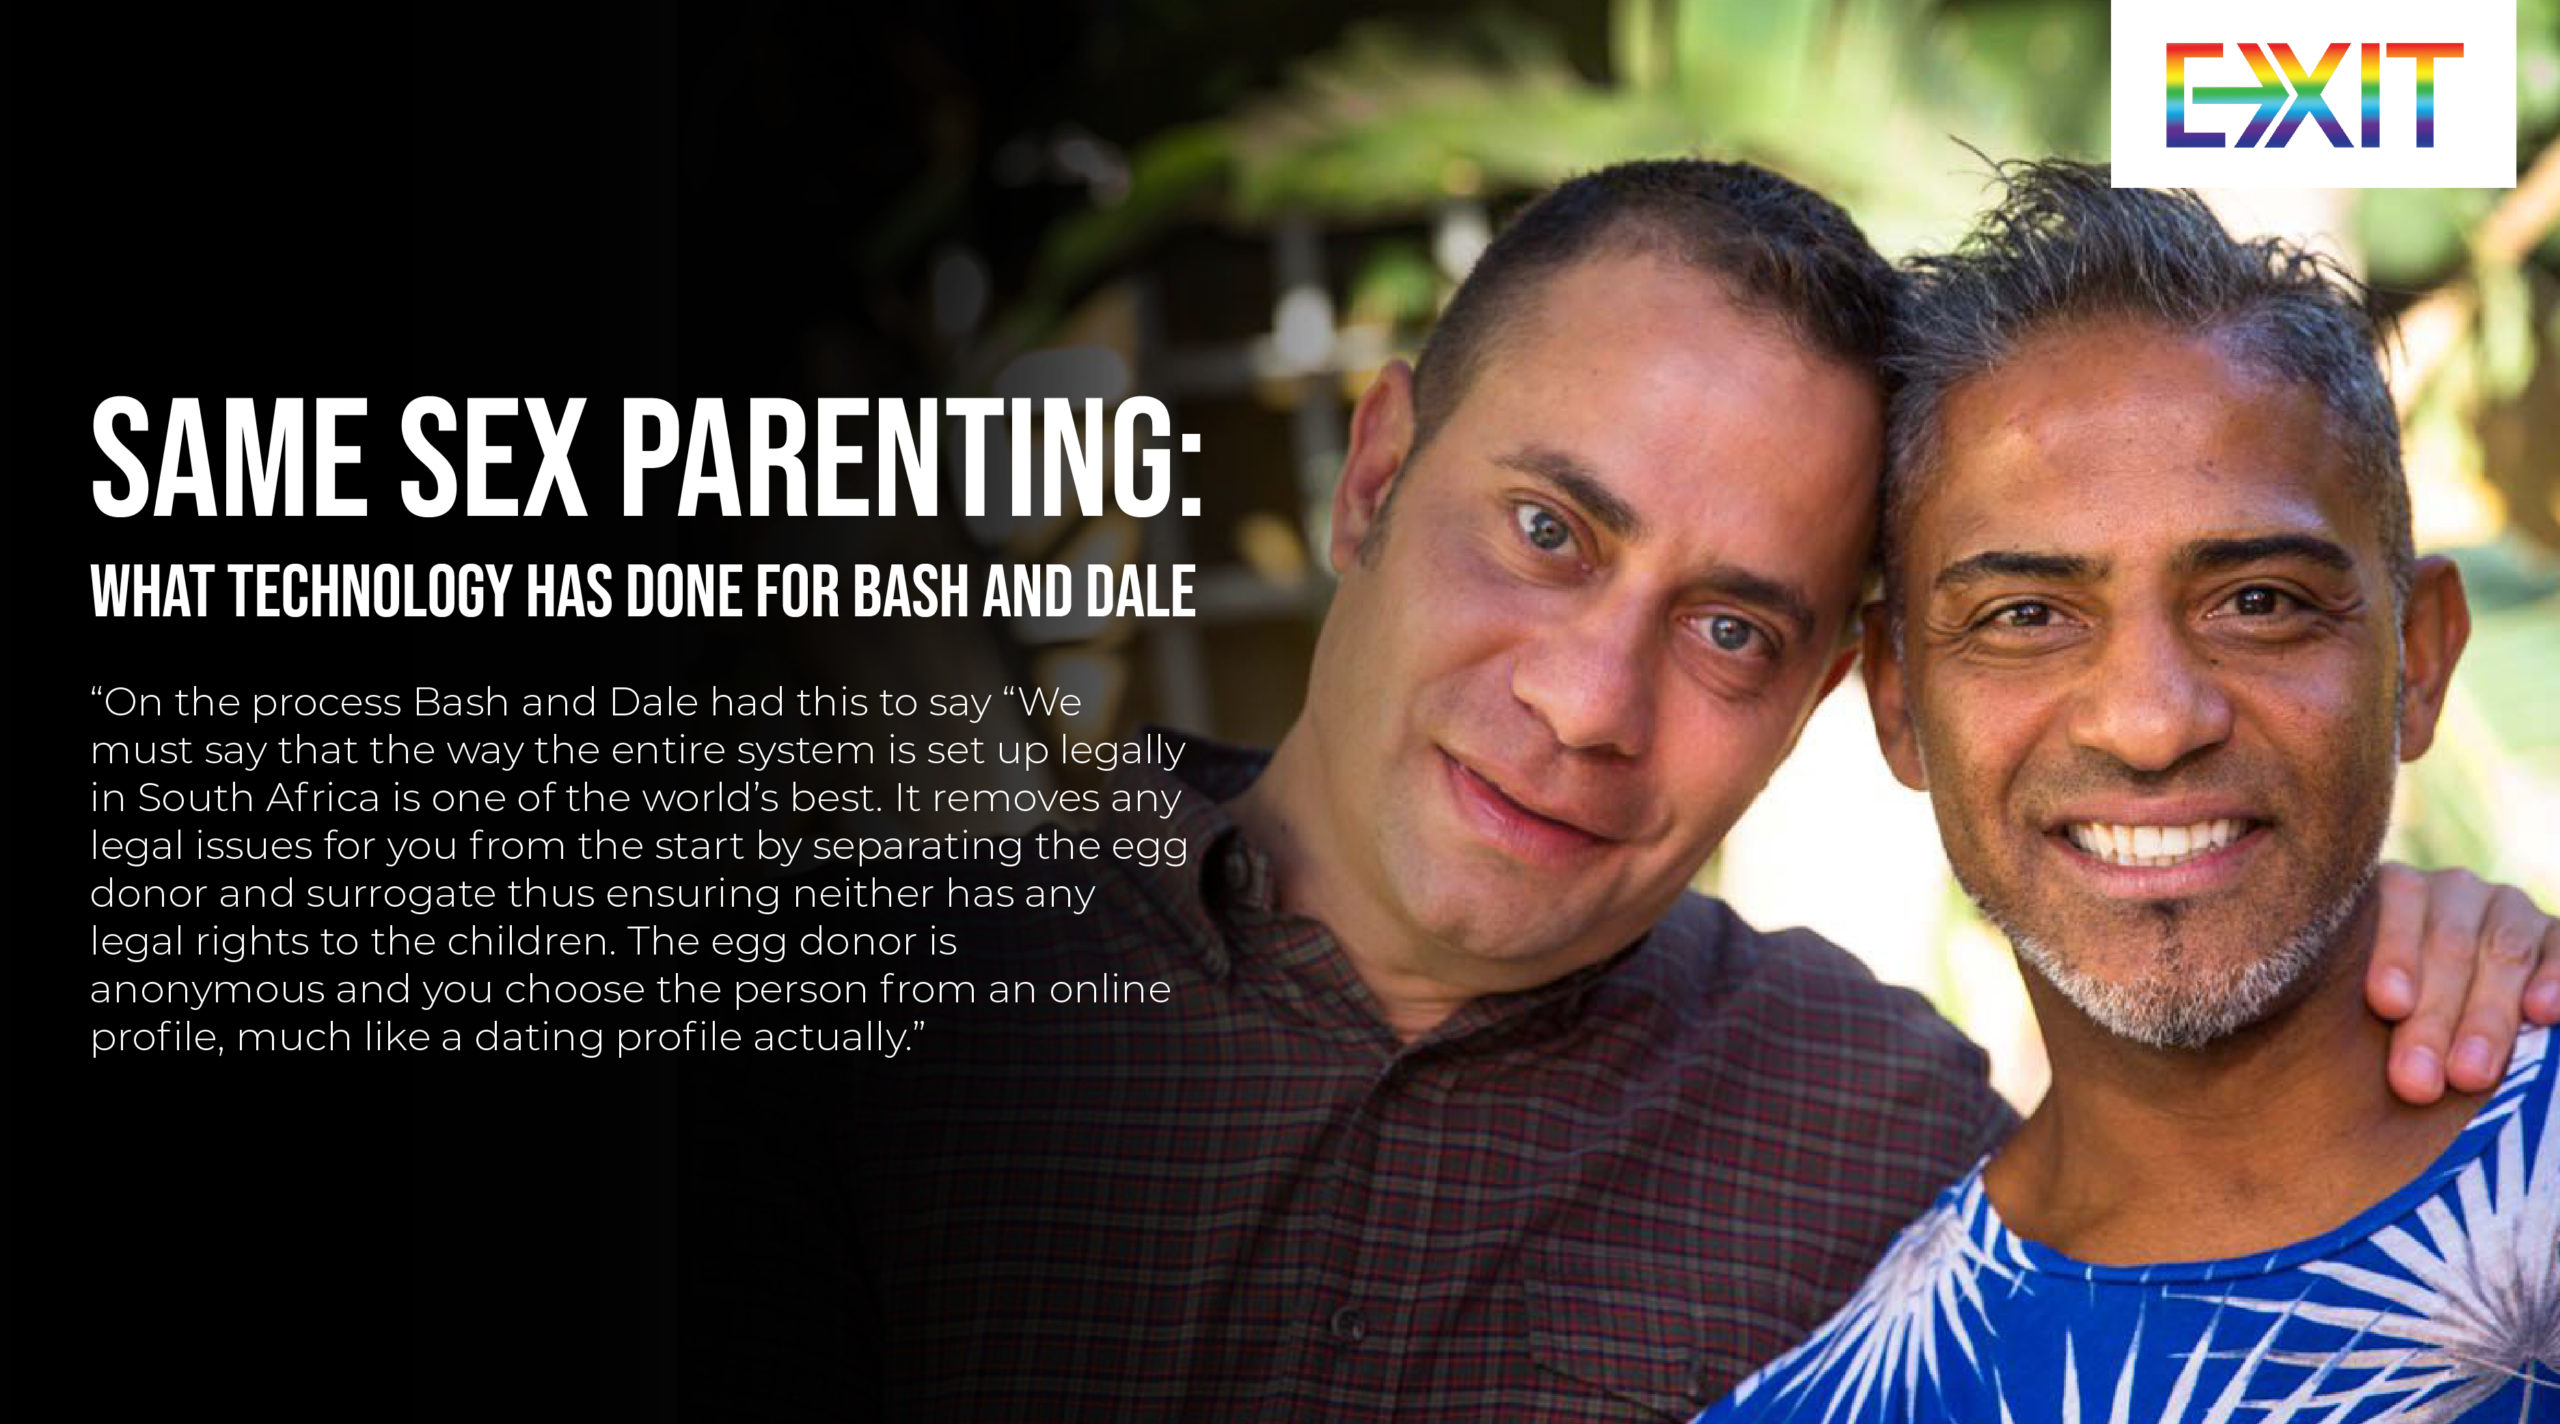 SAME SEX PARENTING